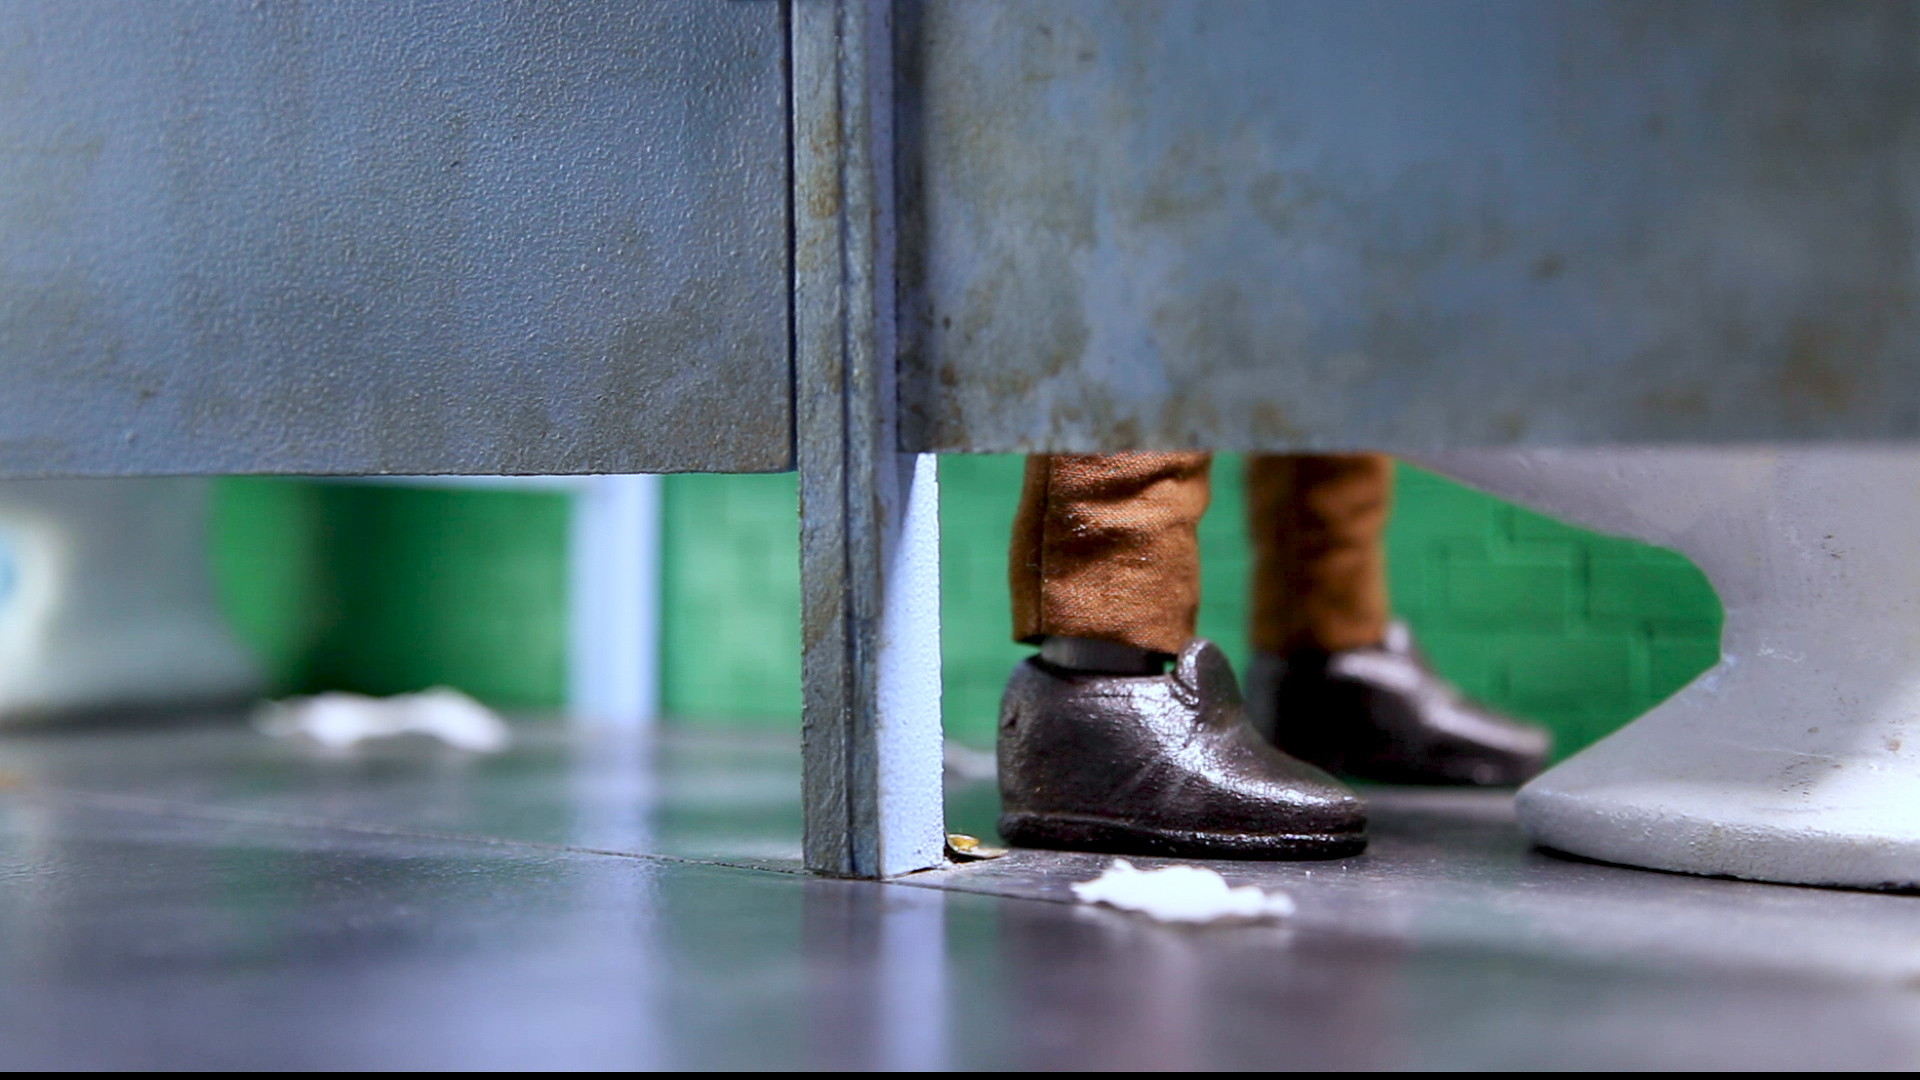 FOOT_STALL.jpg